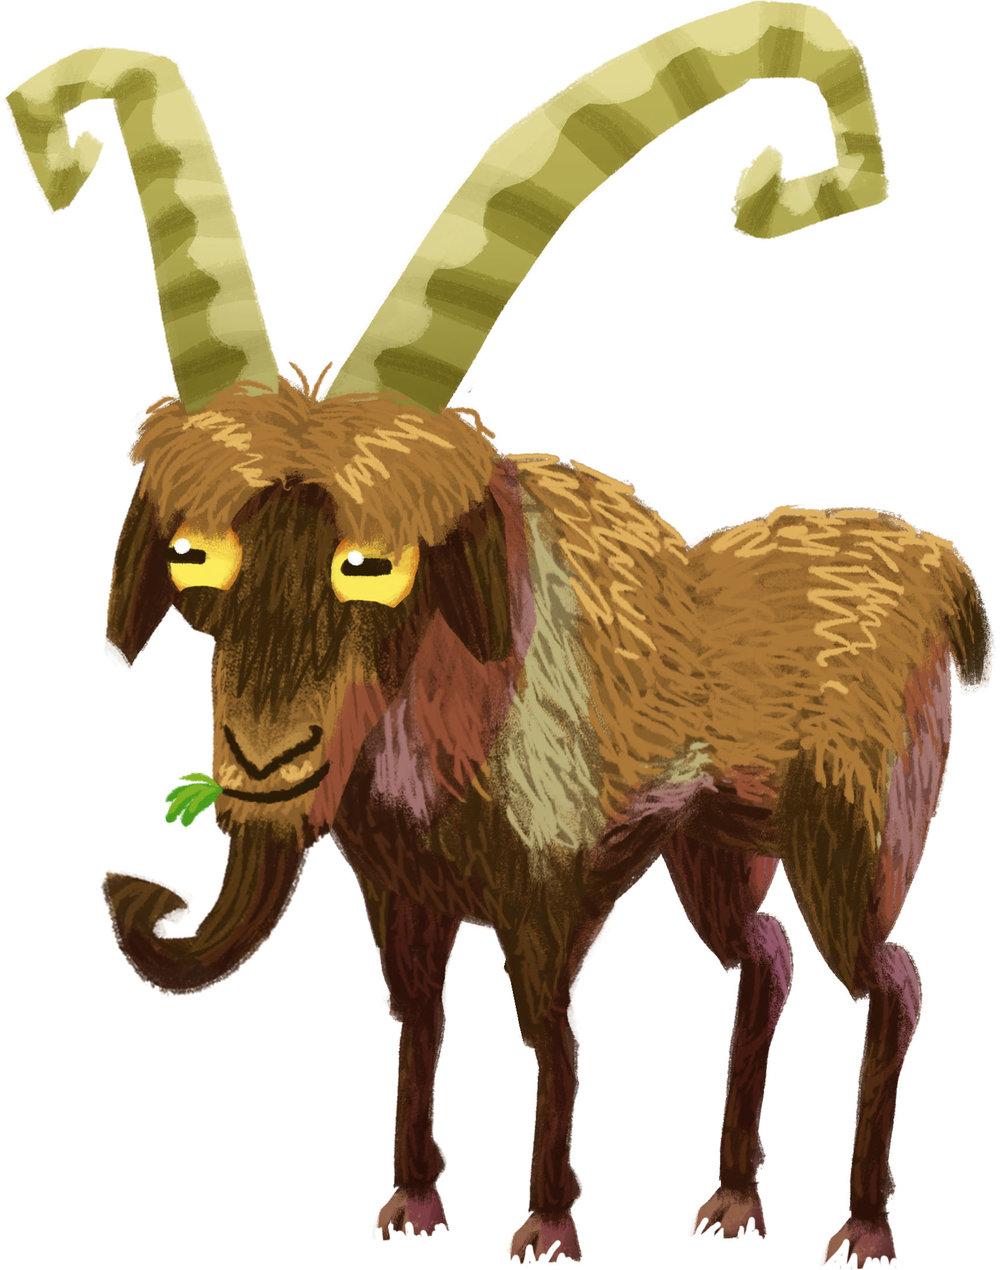 Goat images.jpg